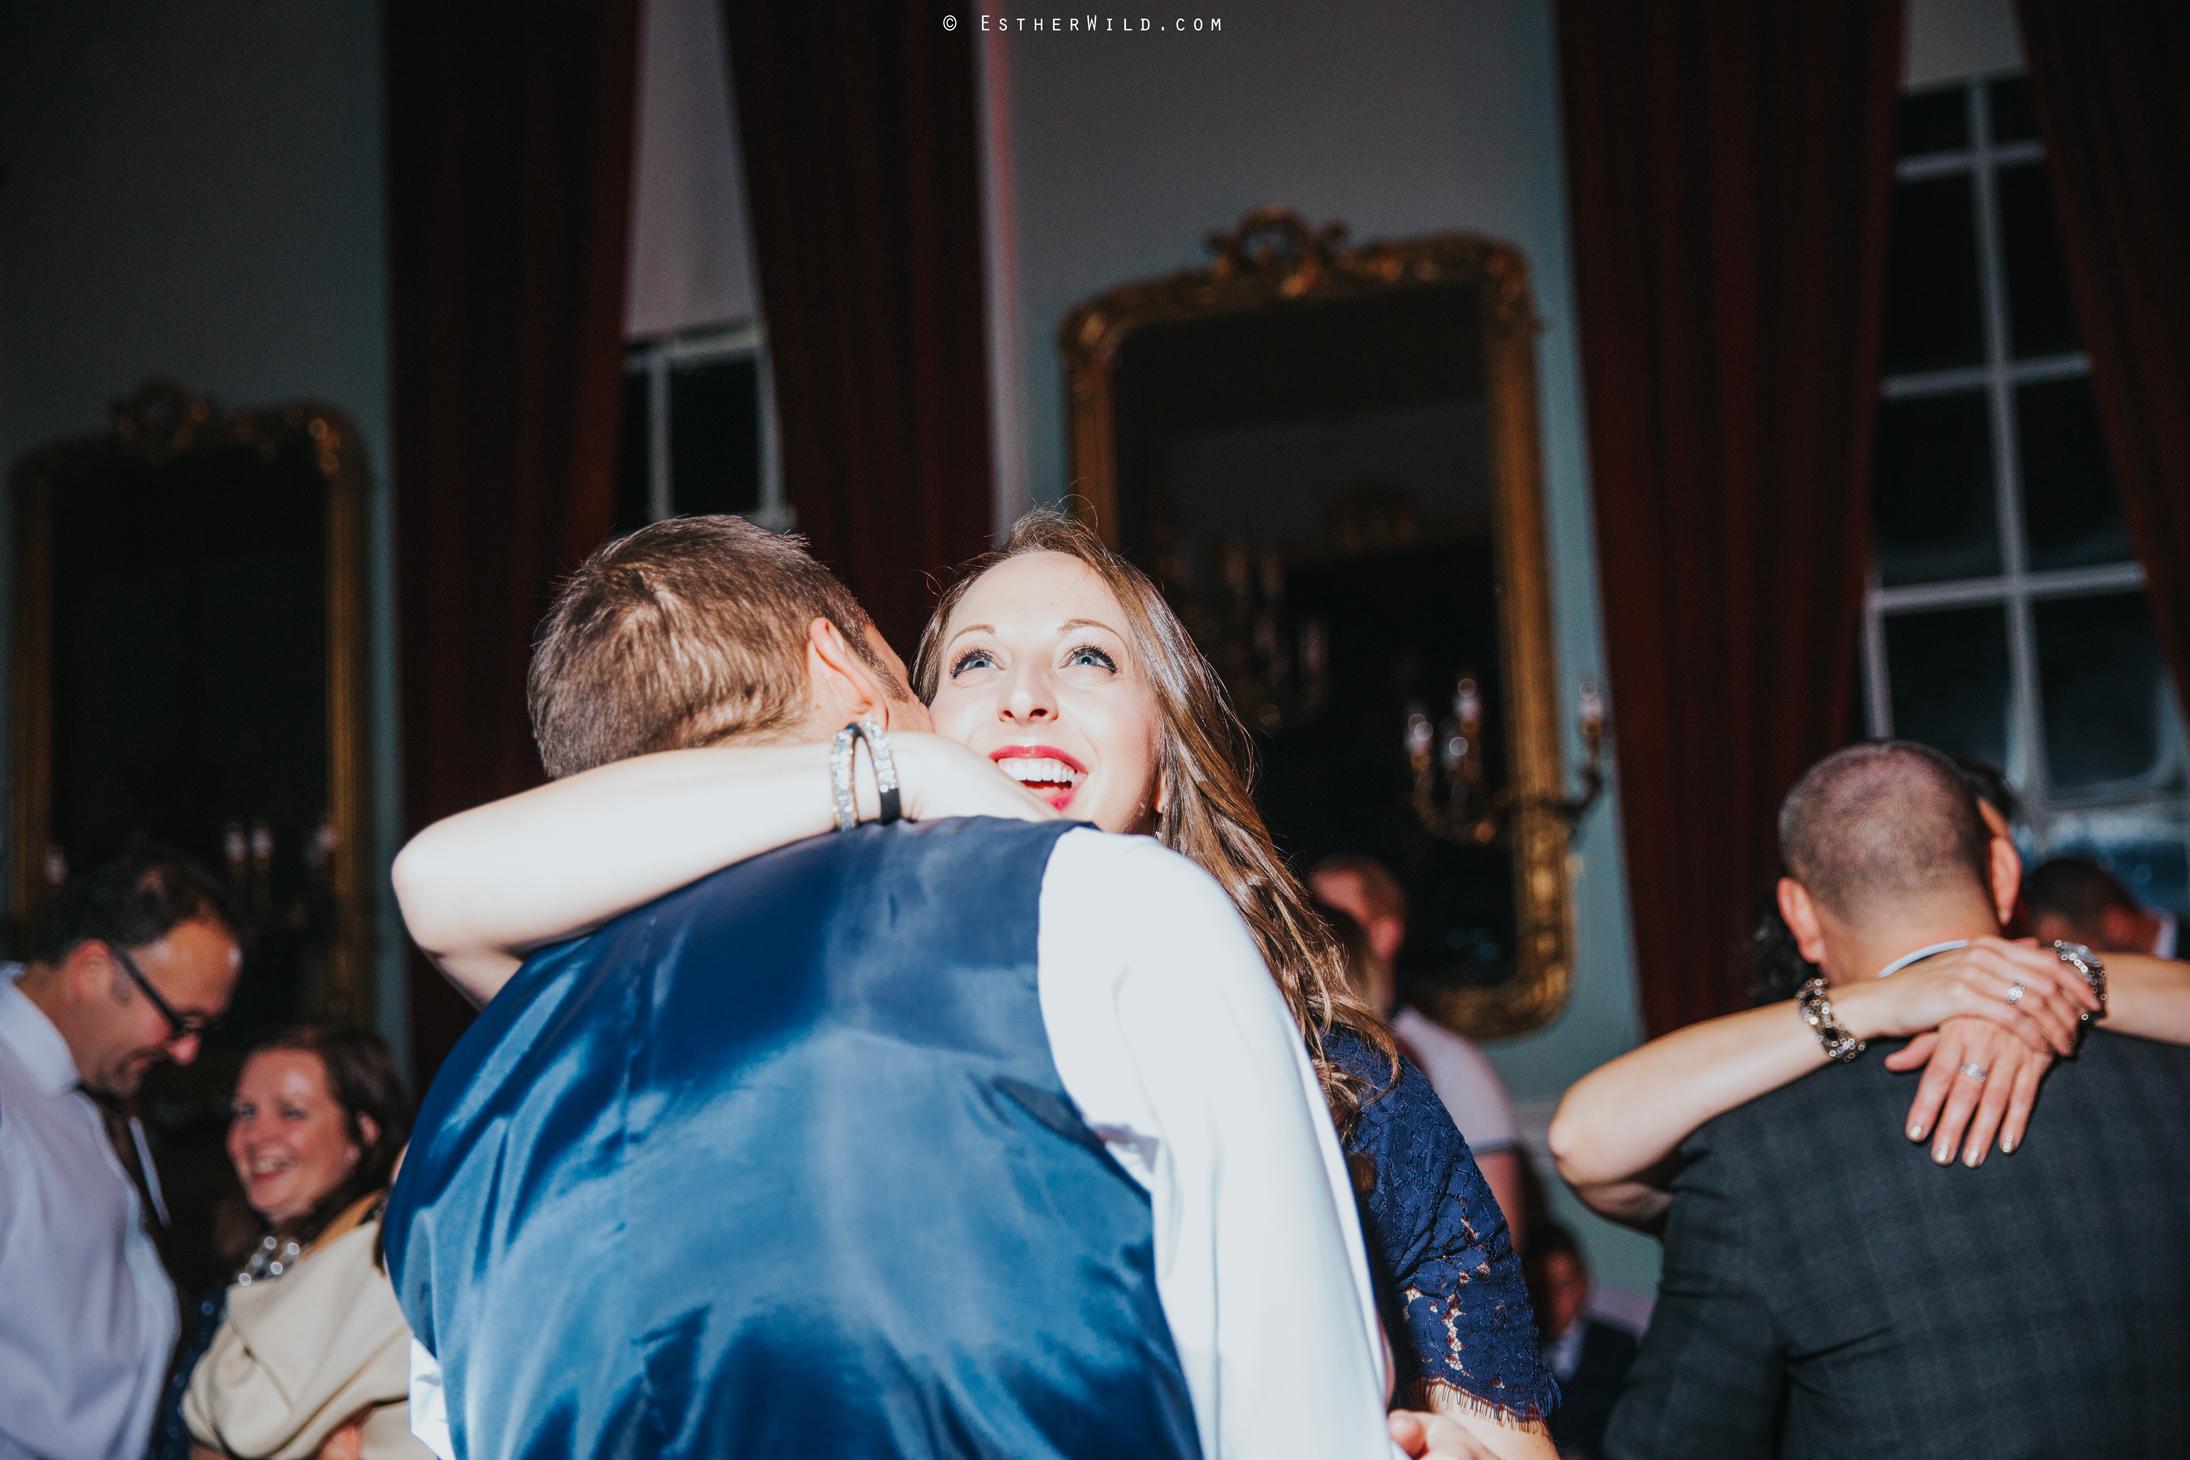 Wedding_Kings_Lynn_Town_Hall_Norfolk_Photographer_Esther_Wild_IMGL0879.jpg